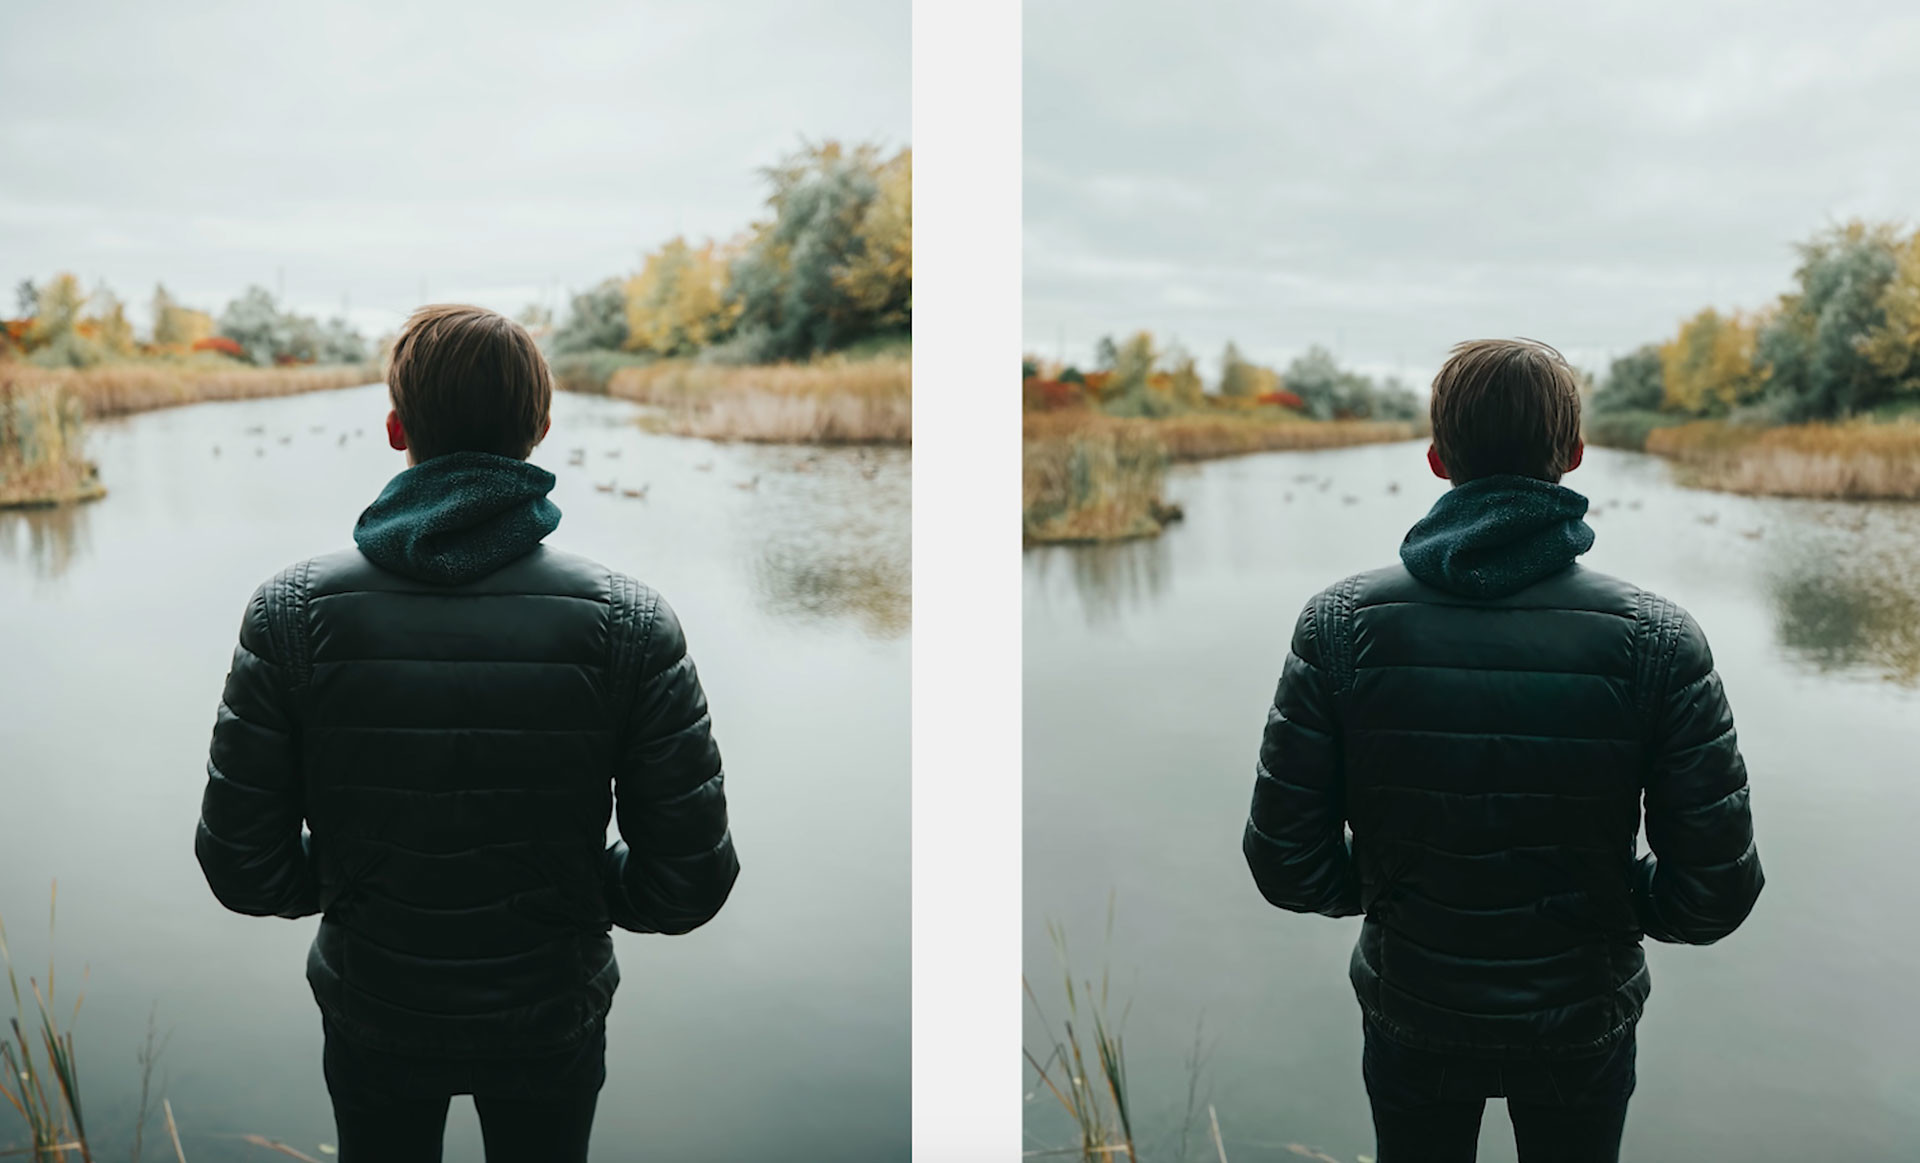 Слева снято на Canon 1DX Mark II, справа — на iPhone 11 Pro. Кадр из видео YouTube / Matti Haapoja